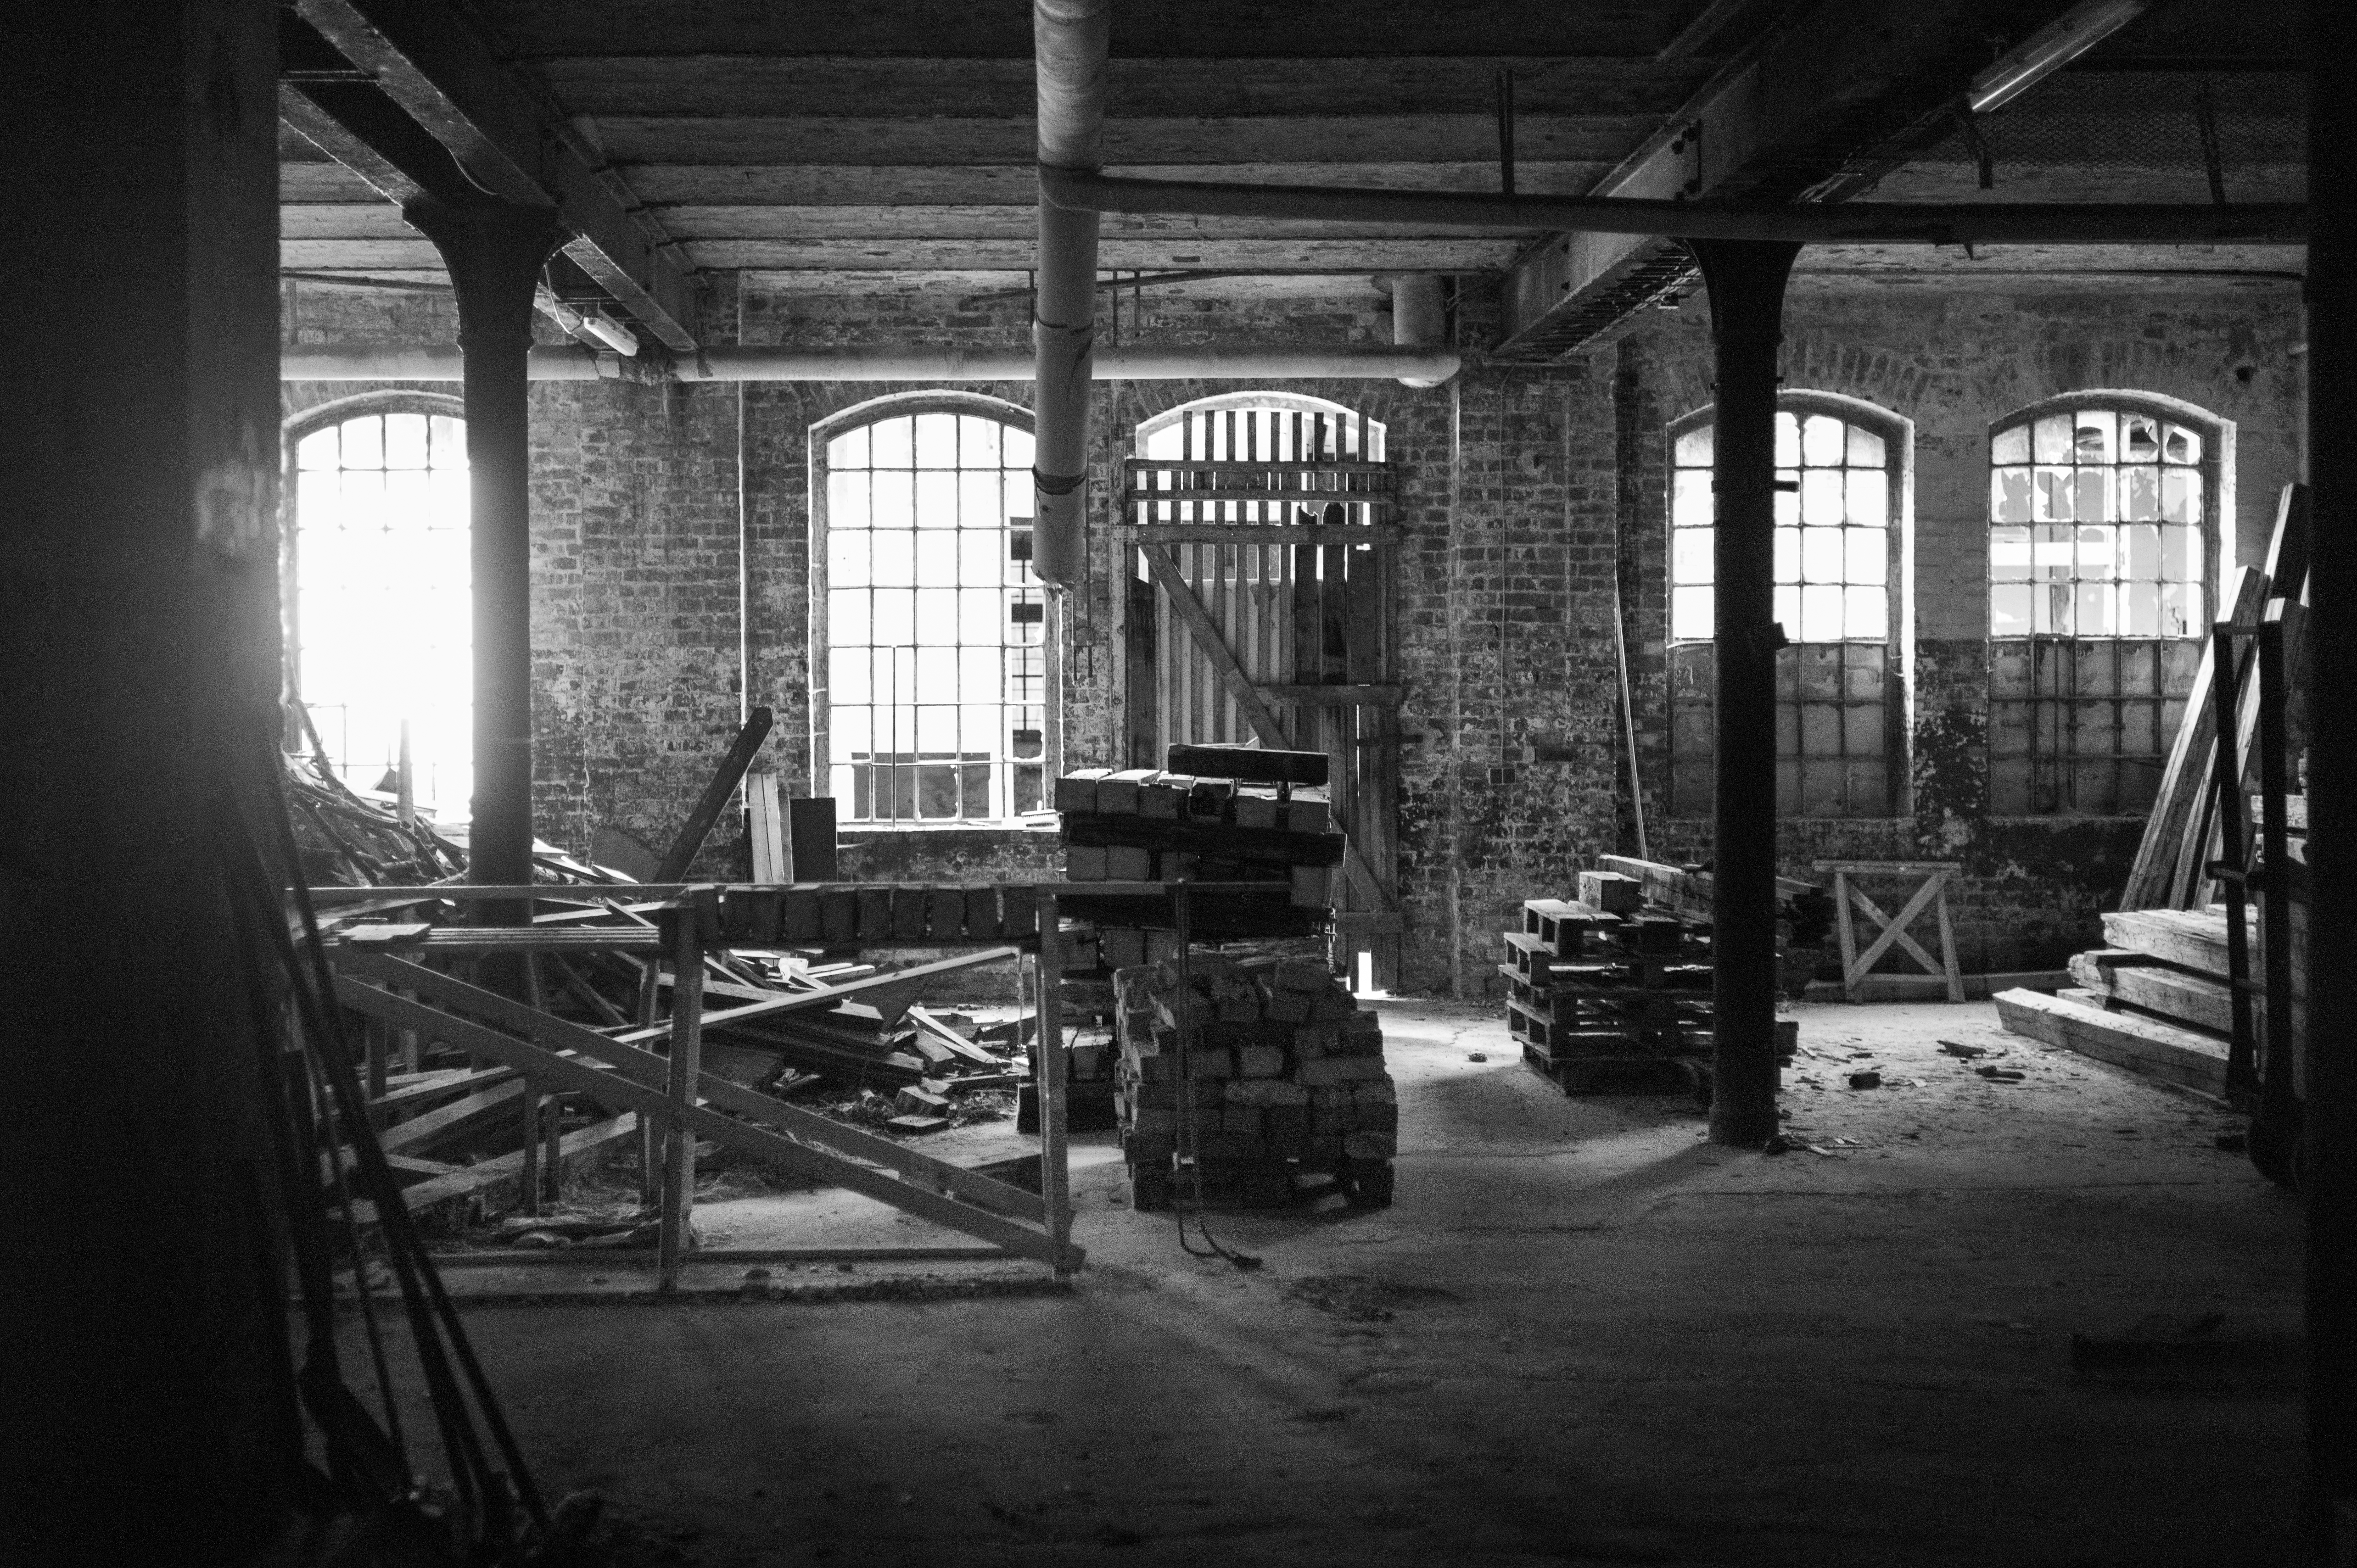 File:Warehouse Interior Leinhausen Repair Workshop Leinhausen Hannover  Germany